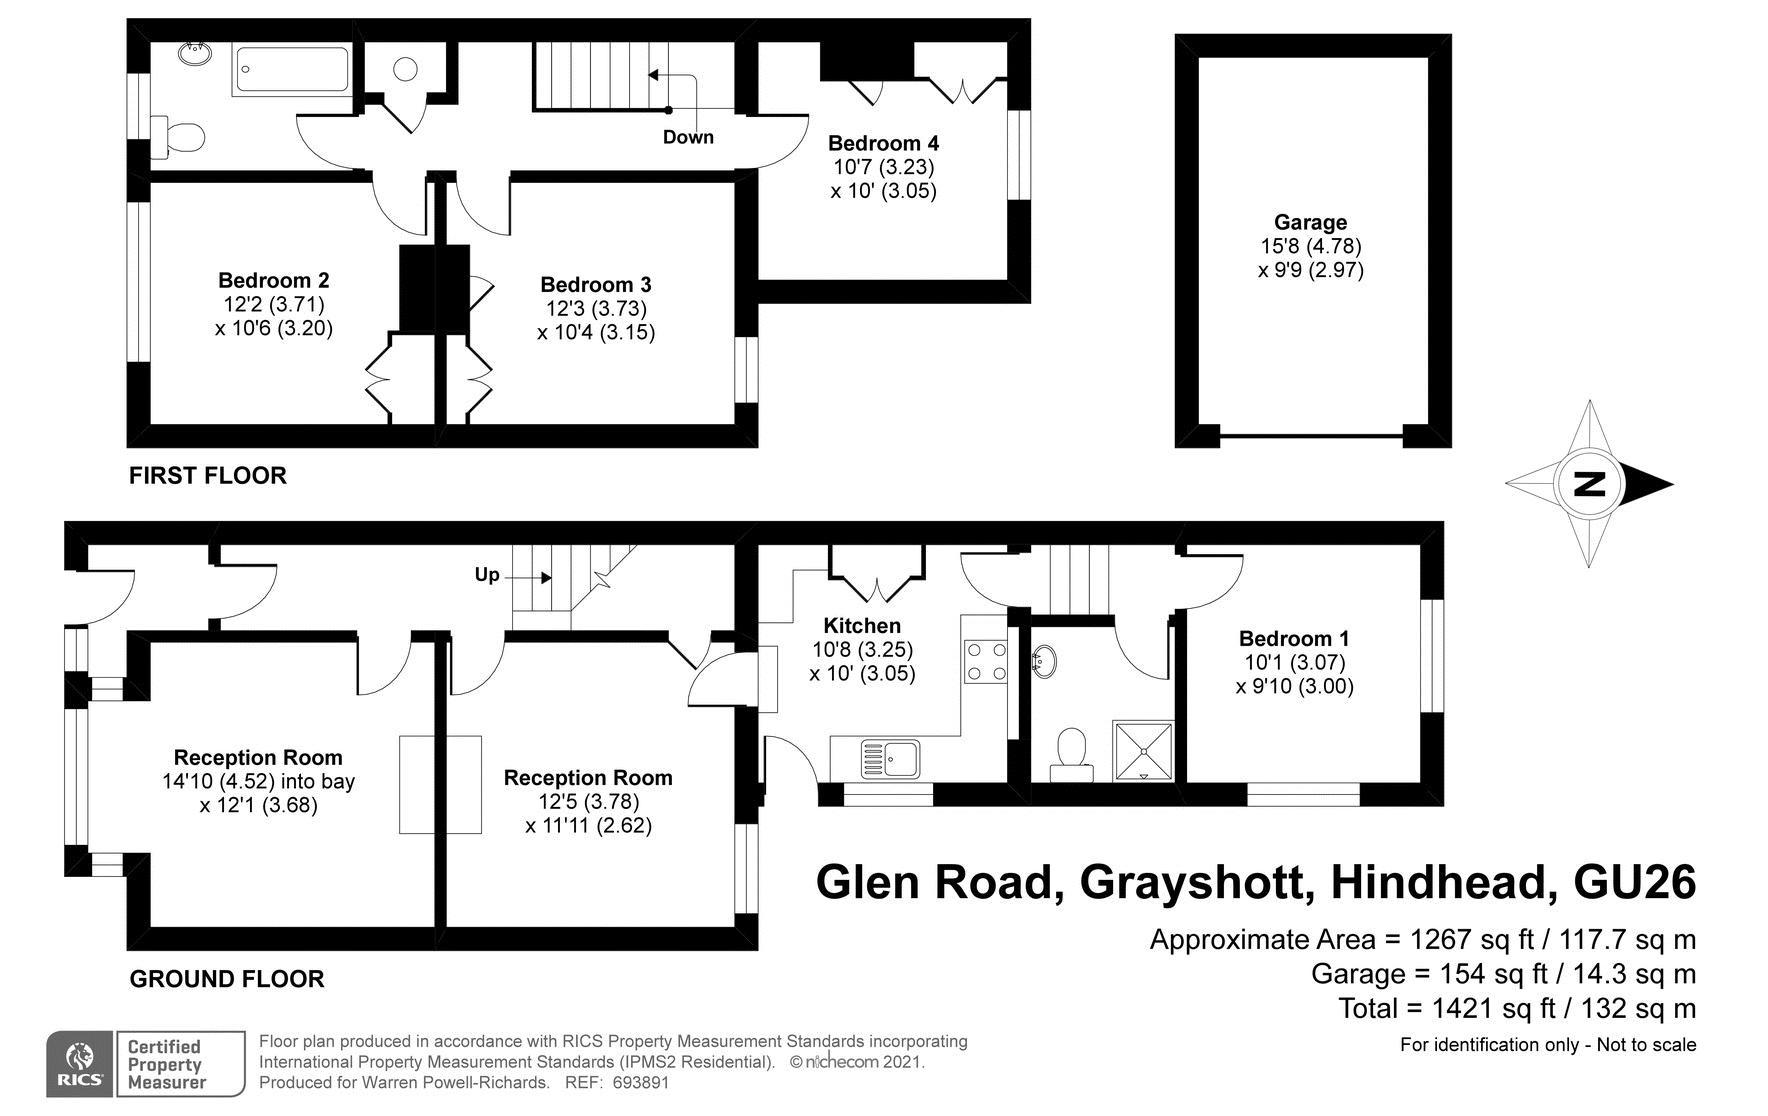 Glen Road Grayshott